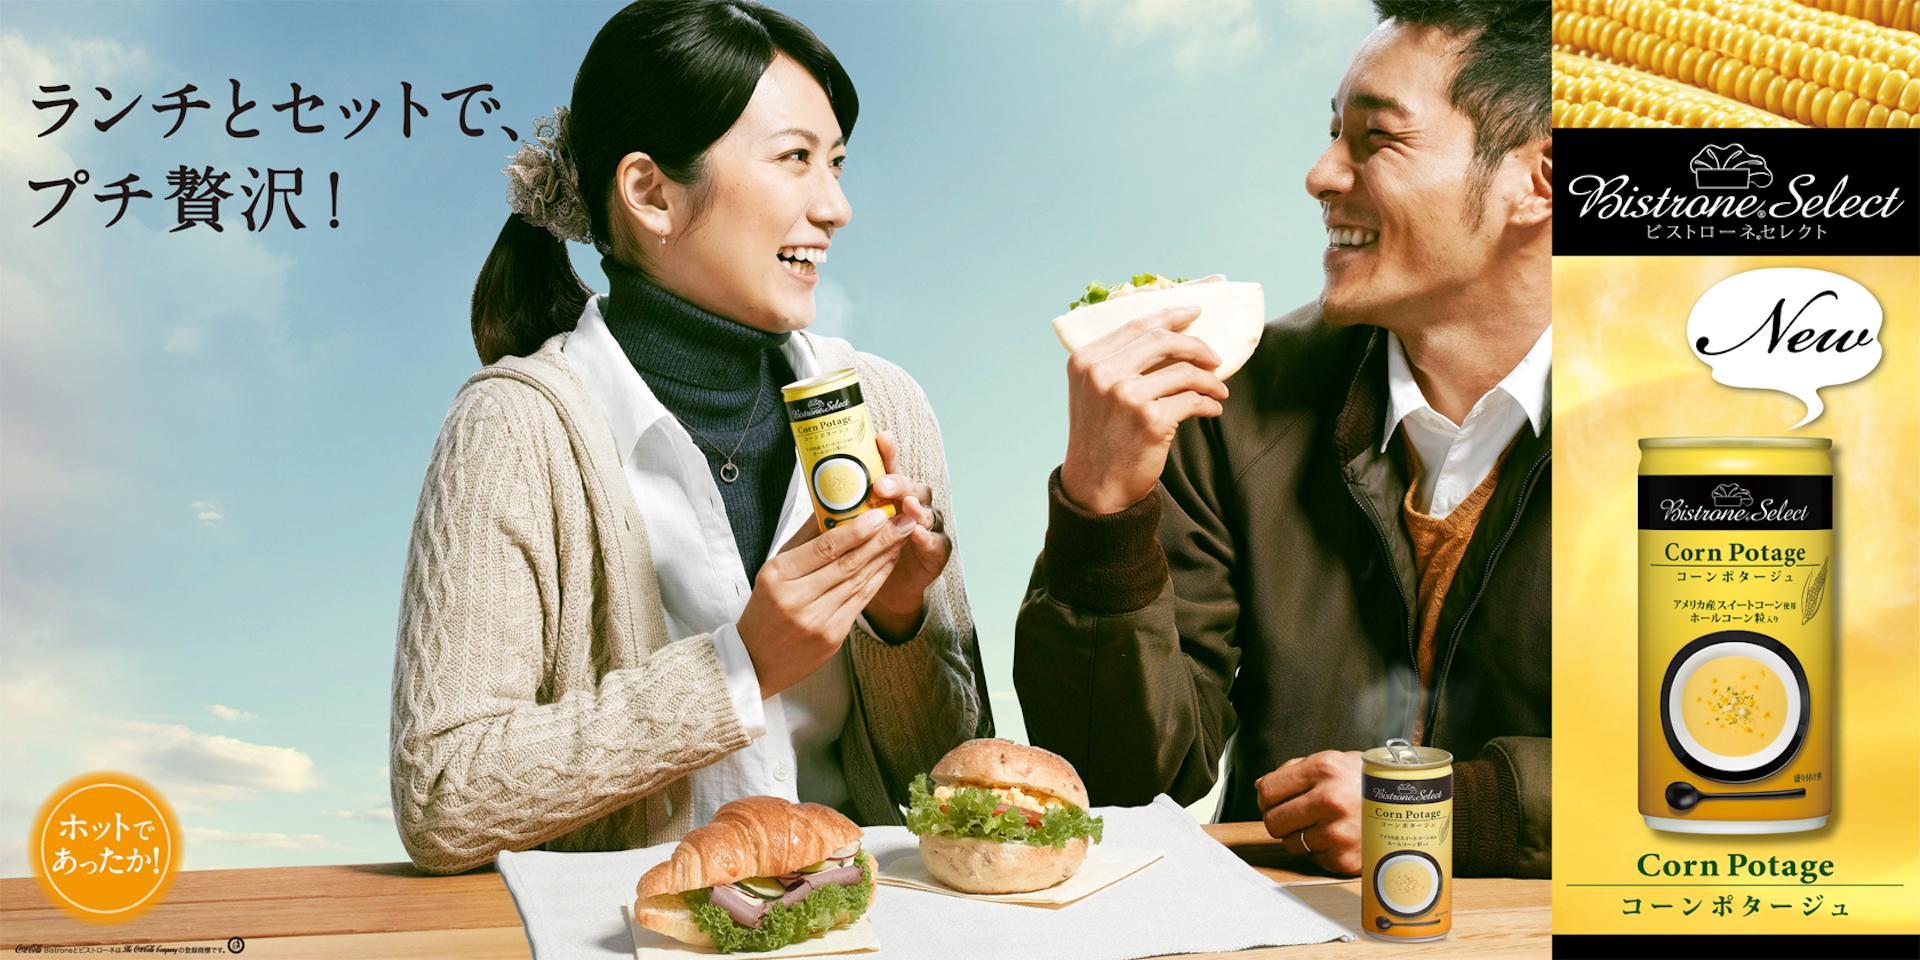 Coca Cola – ビストローネ セレクト  KEN YOSHIMURA HAIR